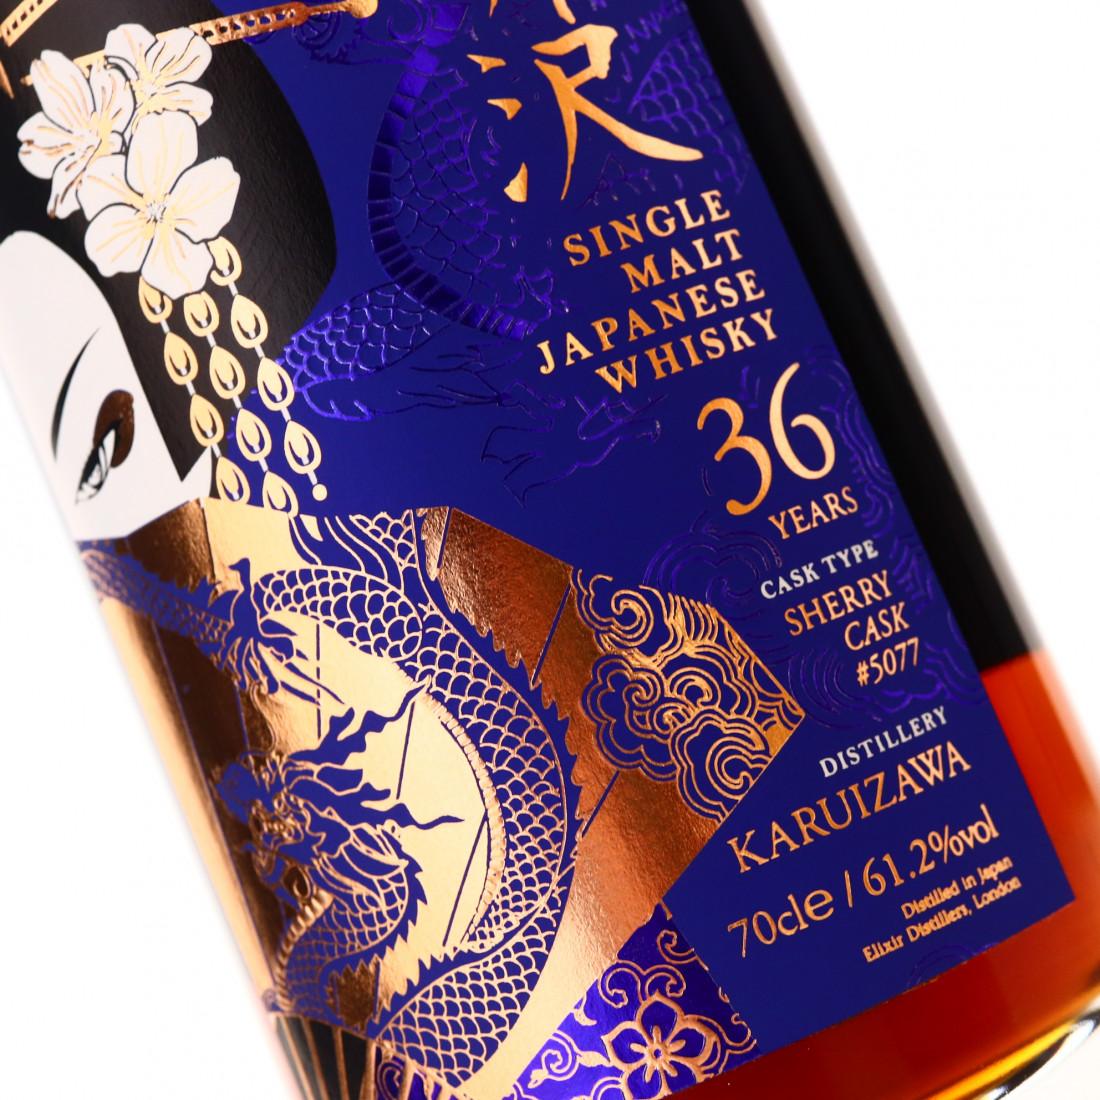 Karuizawa 36 Year Old Single Sherry Cask #5077 / Sapphire Geisha